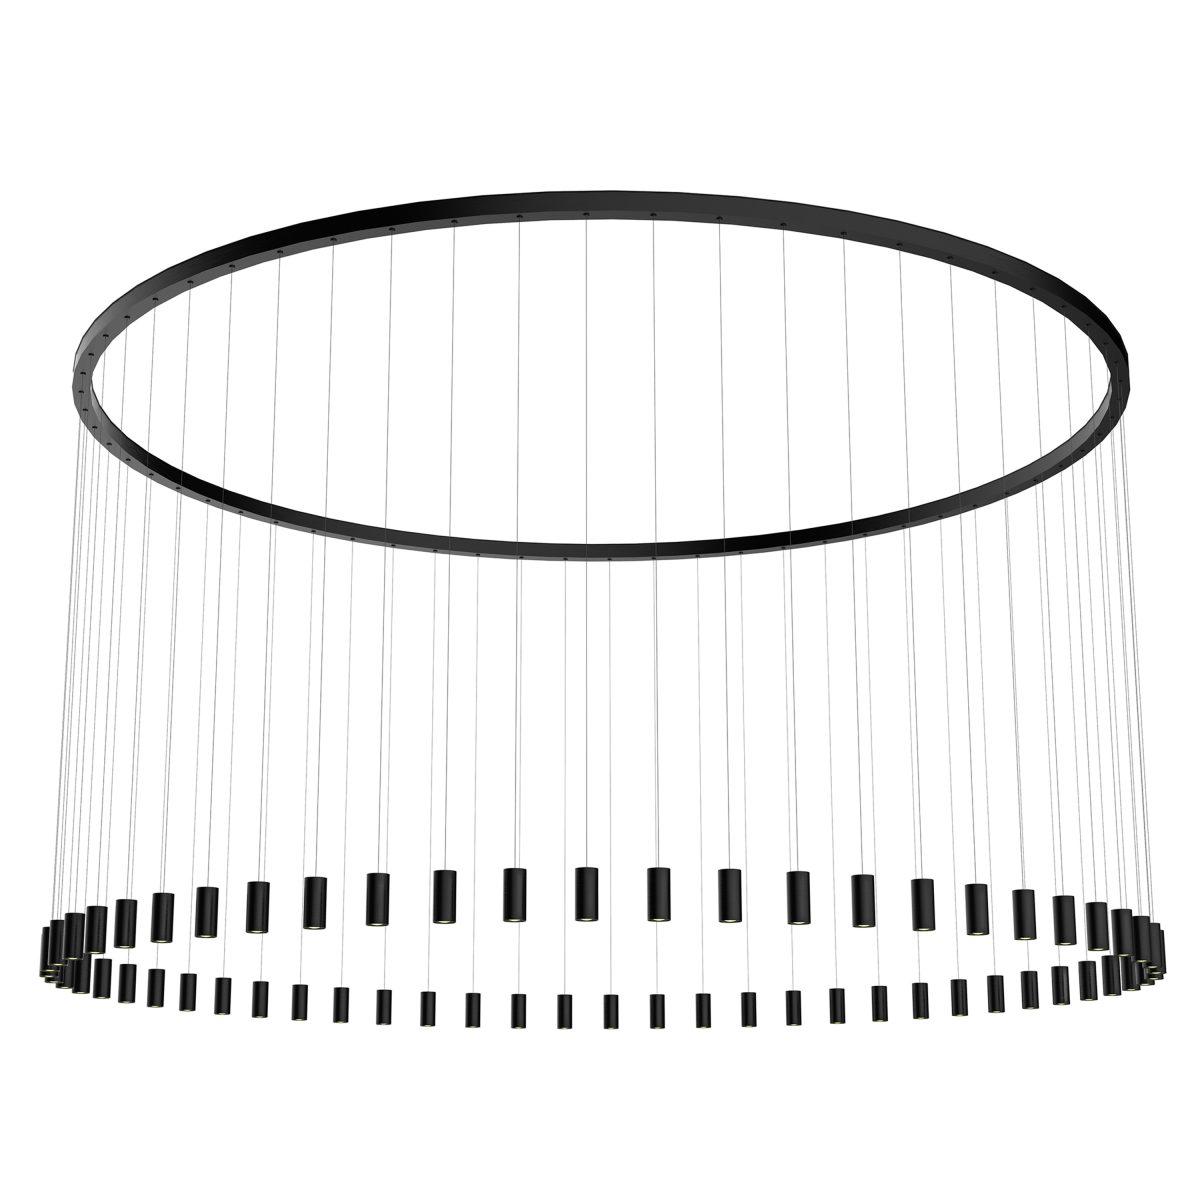 JSPR Myla Lamp XL 150 Black